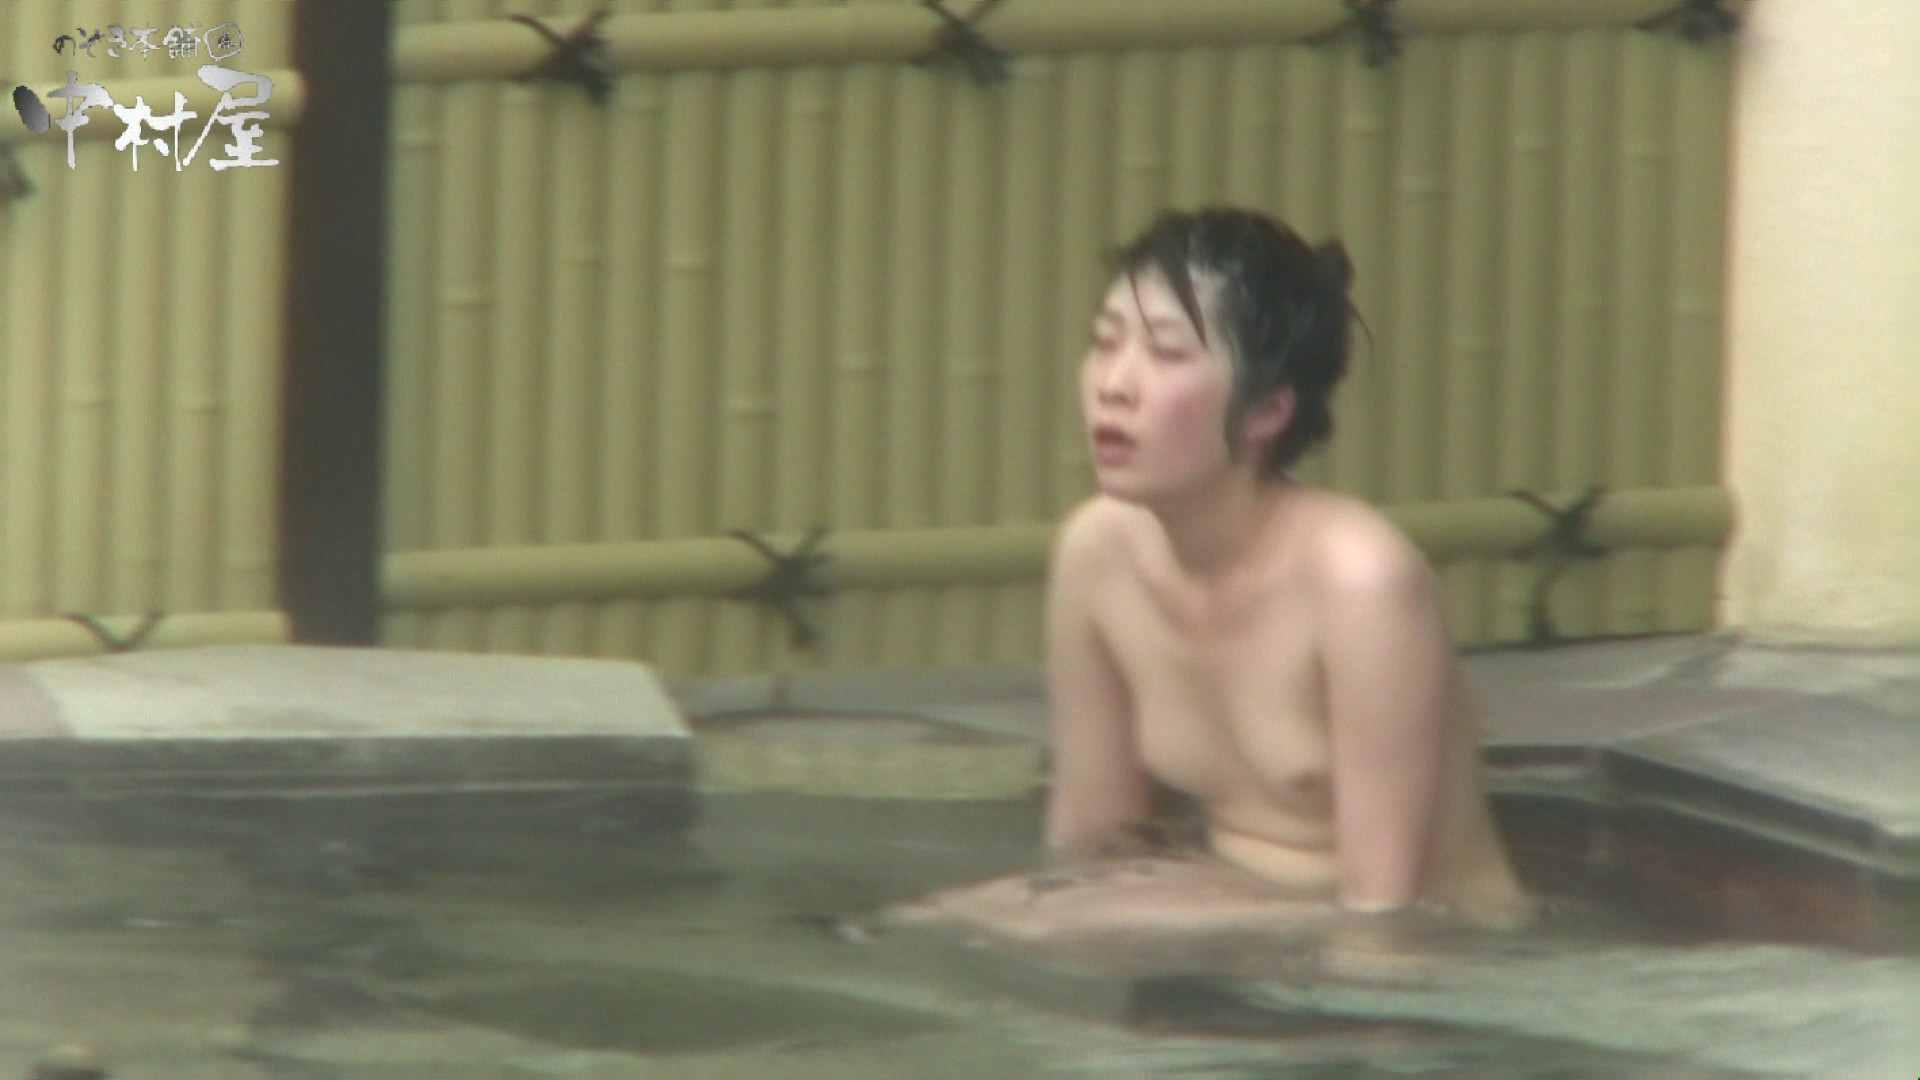 Aquaな露天風呂Vol.955 盗撮師作品  85pic 21